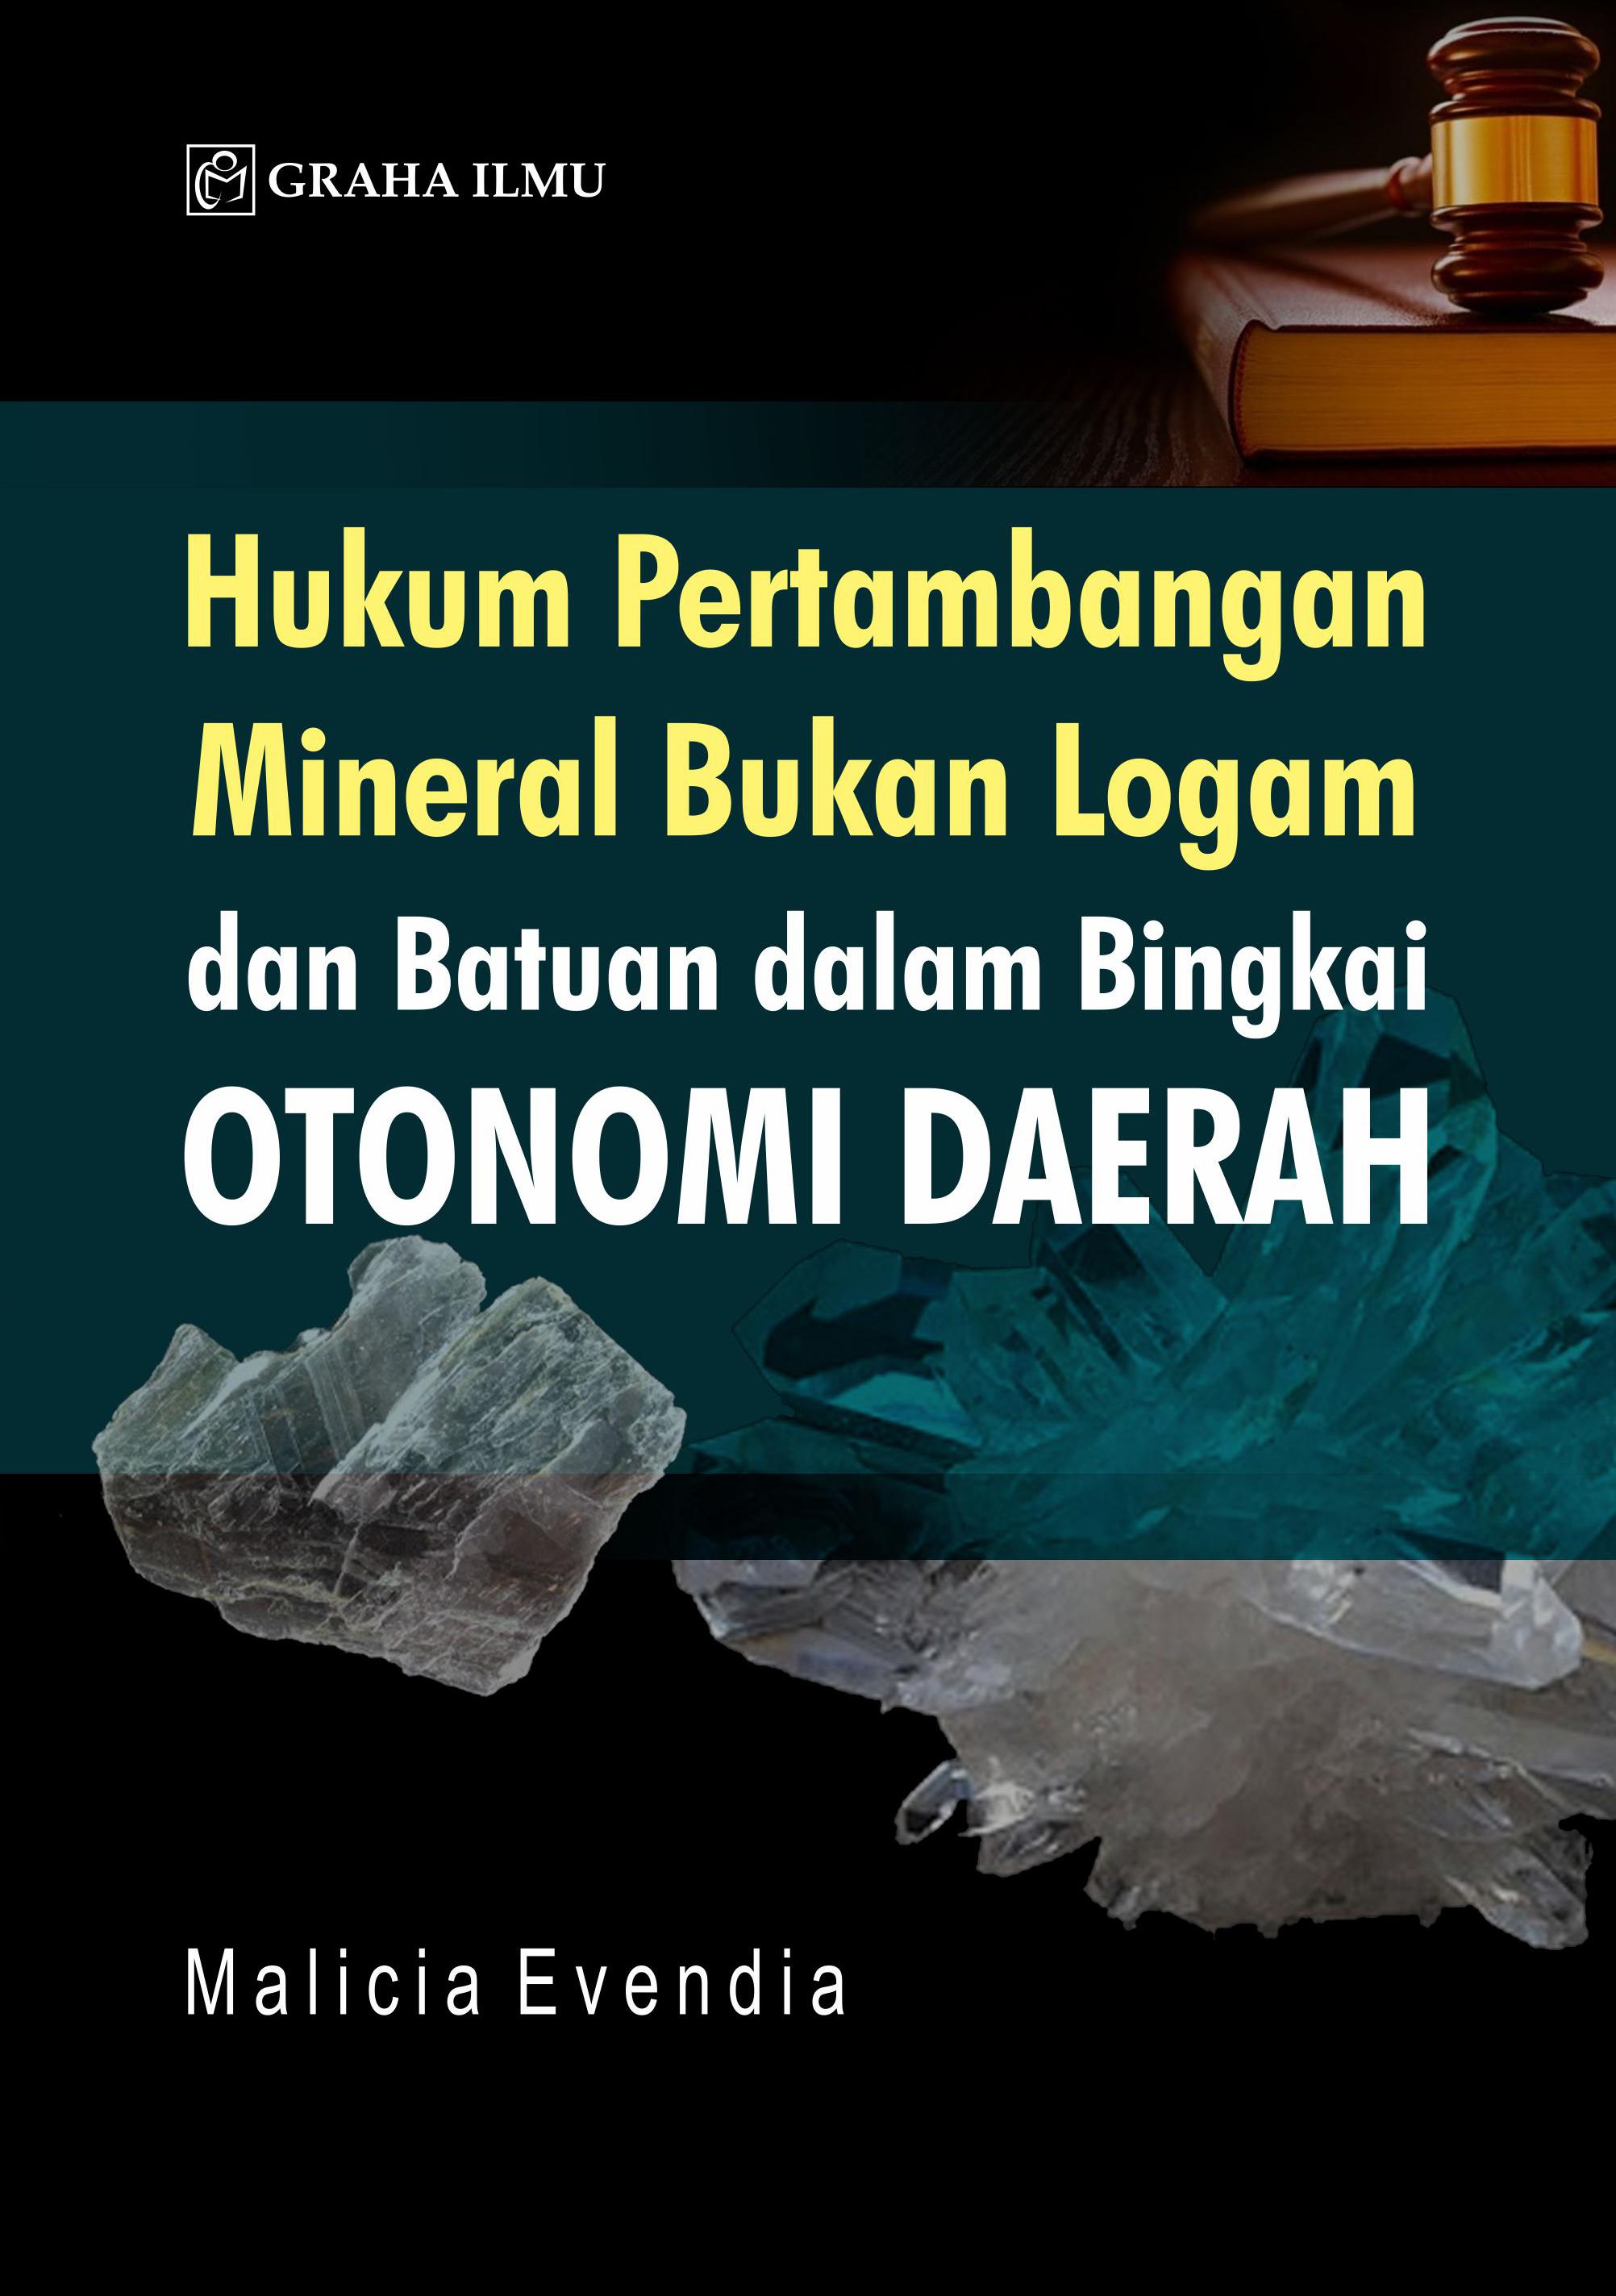 Hukum pertambangan mineral bukan logam dan bantuan dalam bingkai otonomi daerah [sumber elektronis]